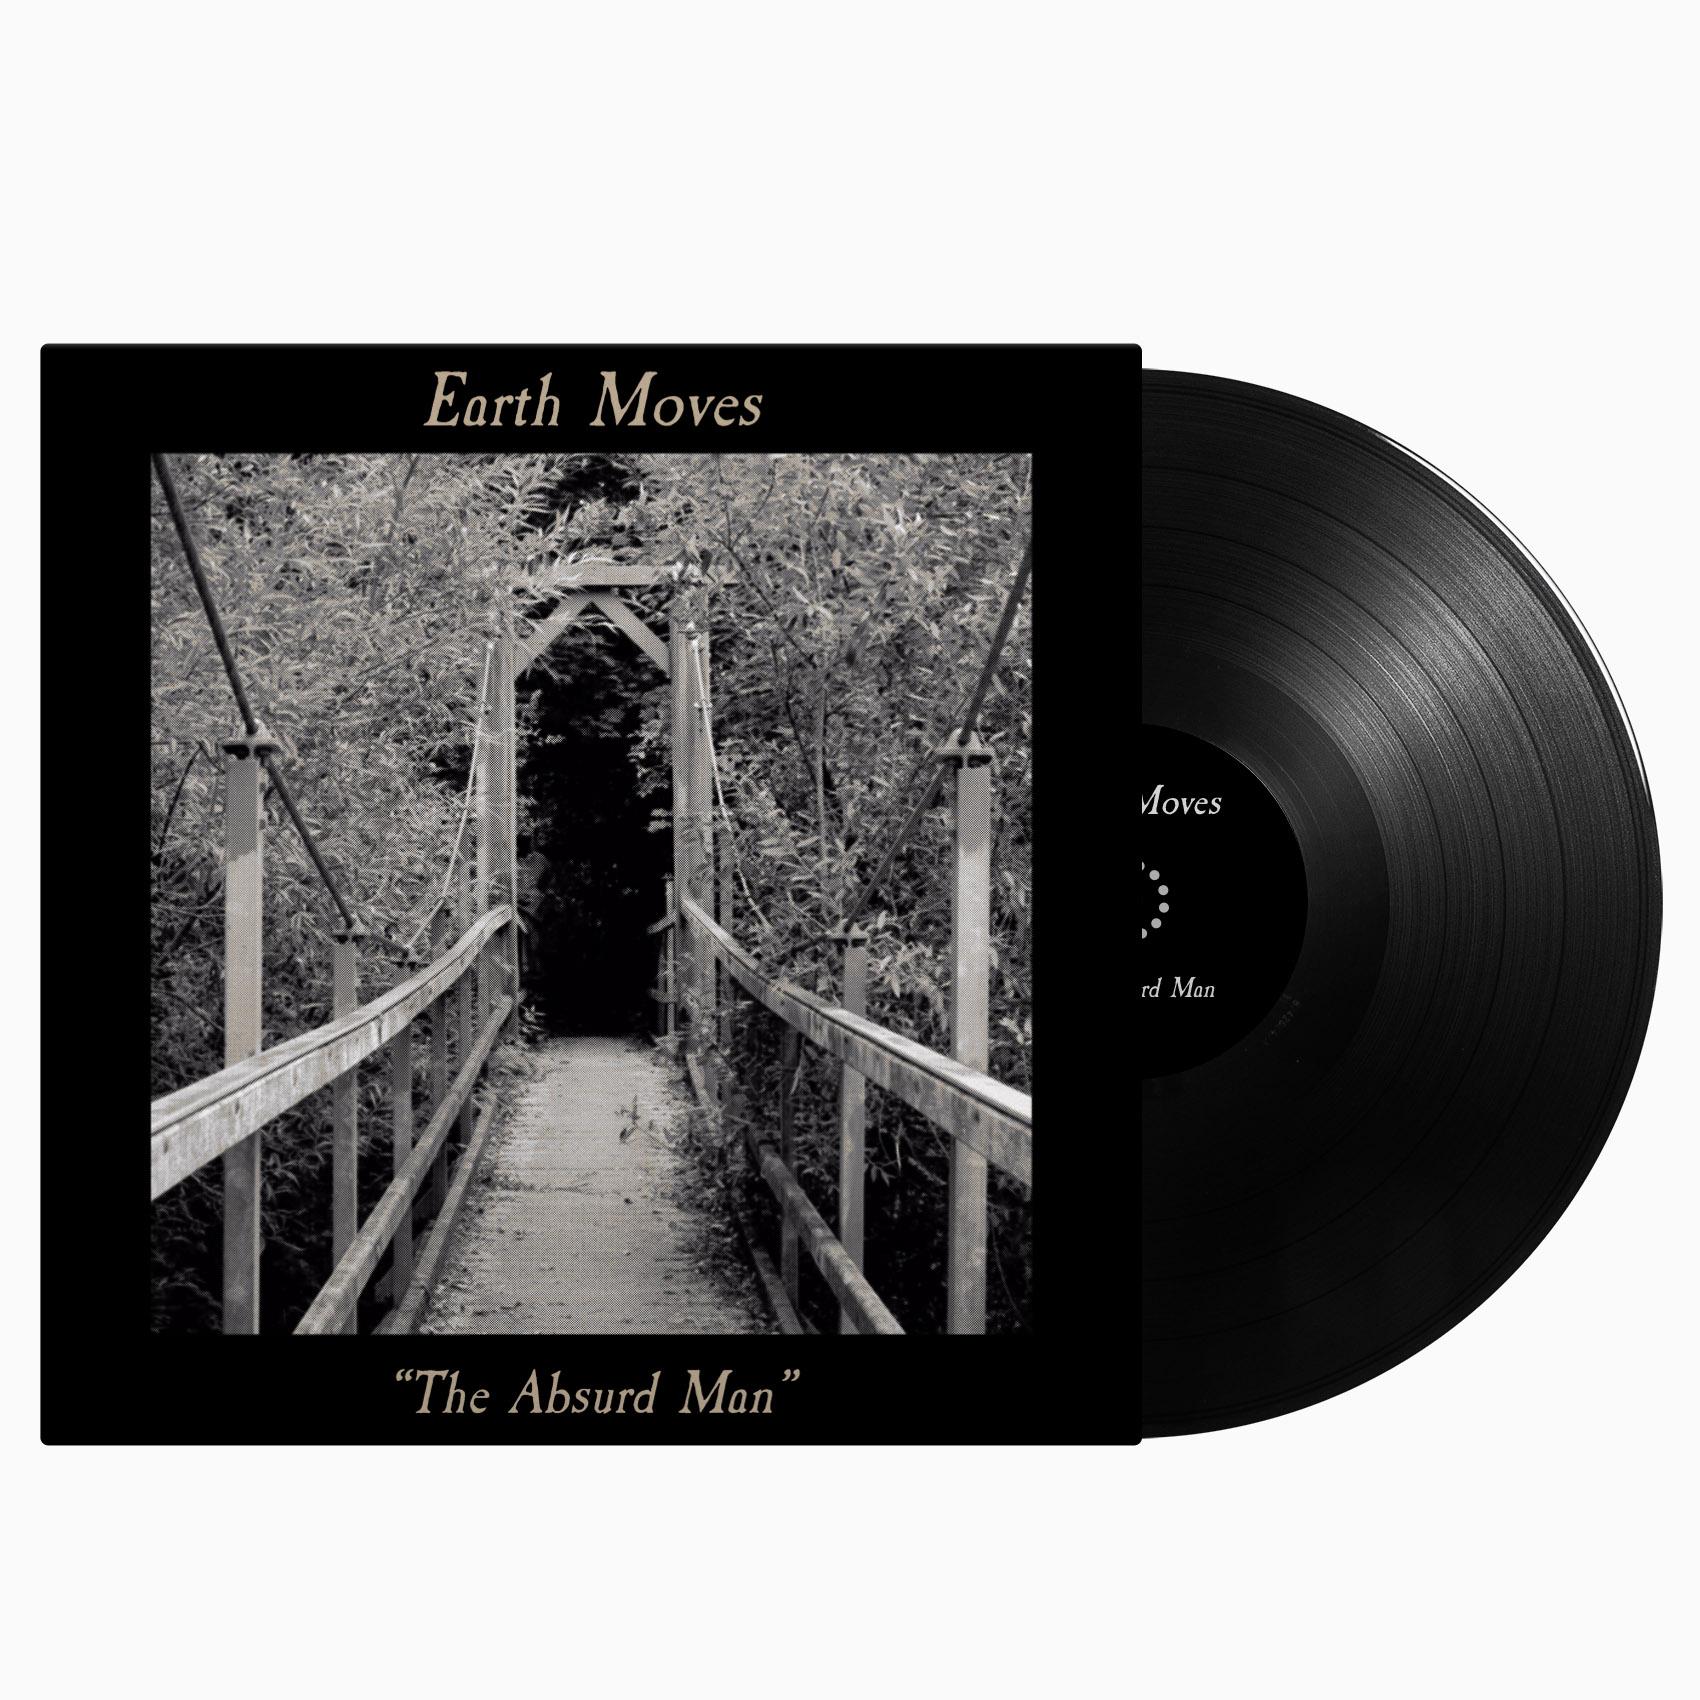 Earth Moves - The Absurd Man